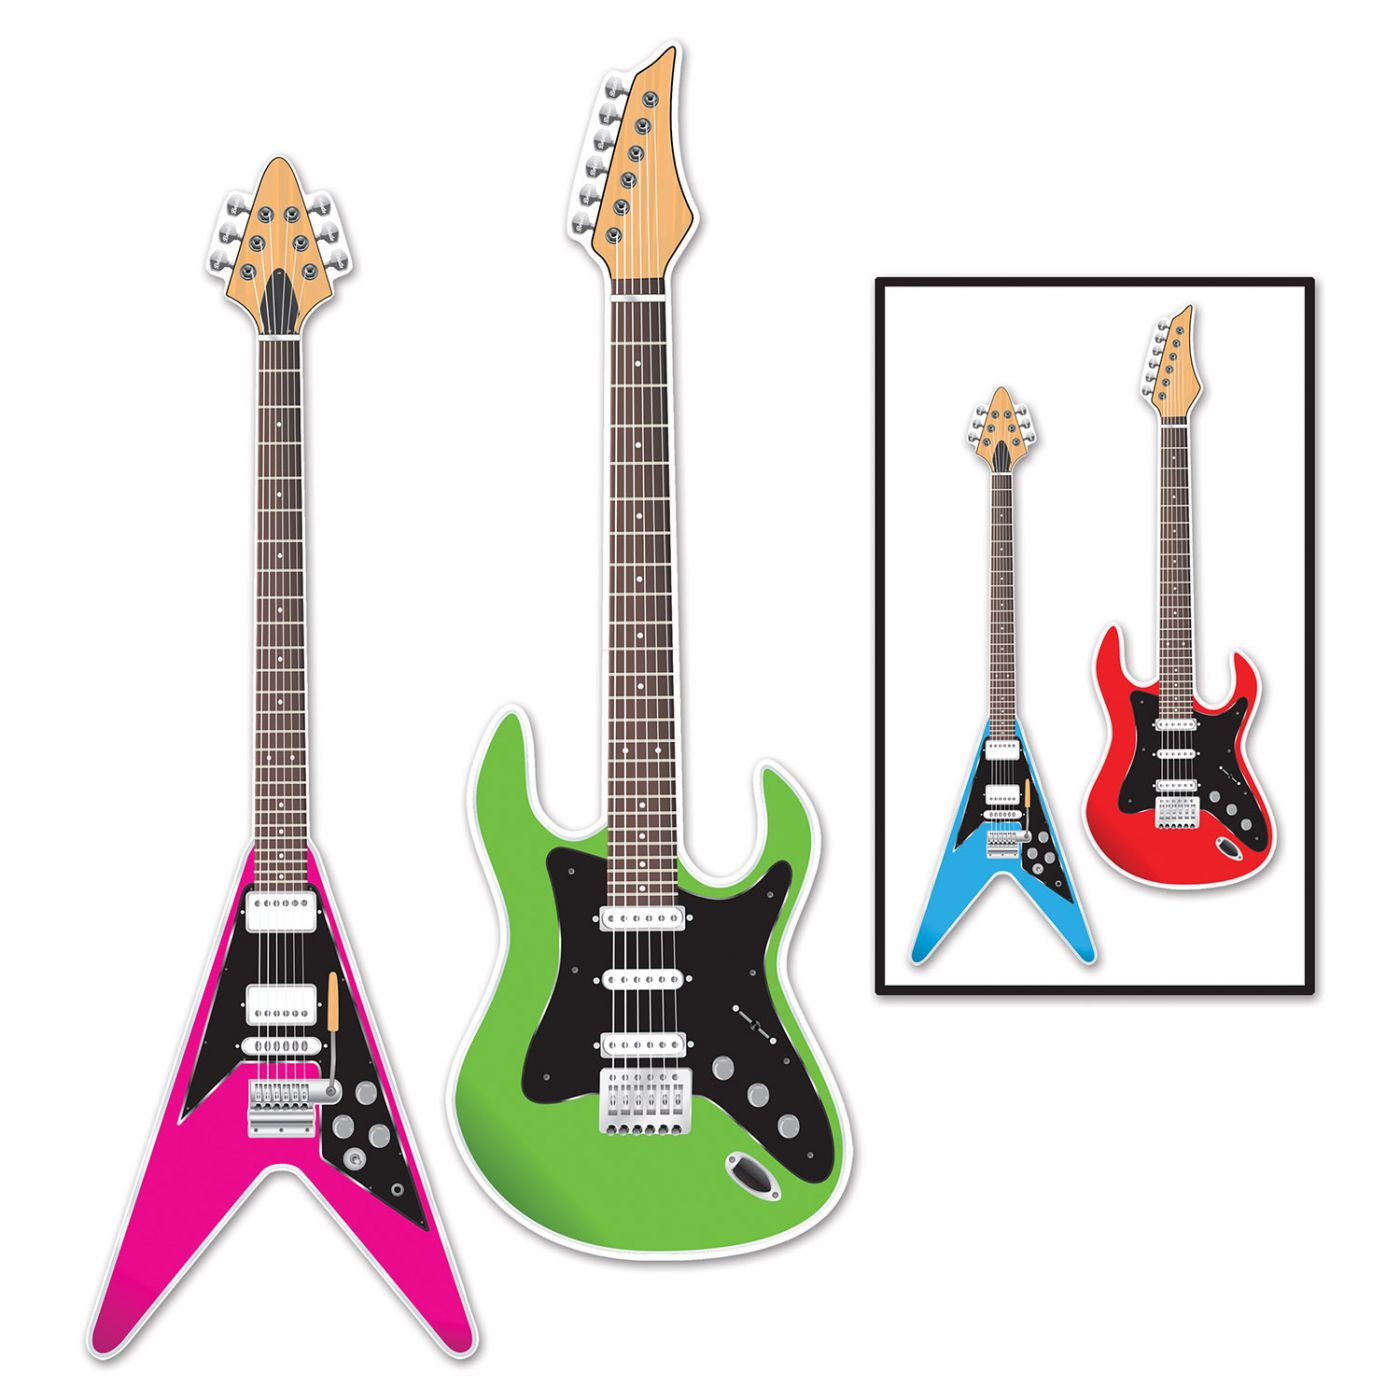 Guitar Cutouts image